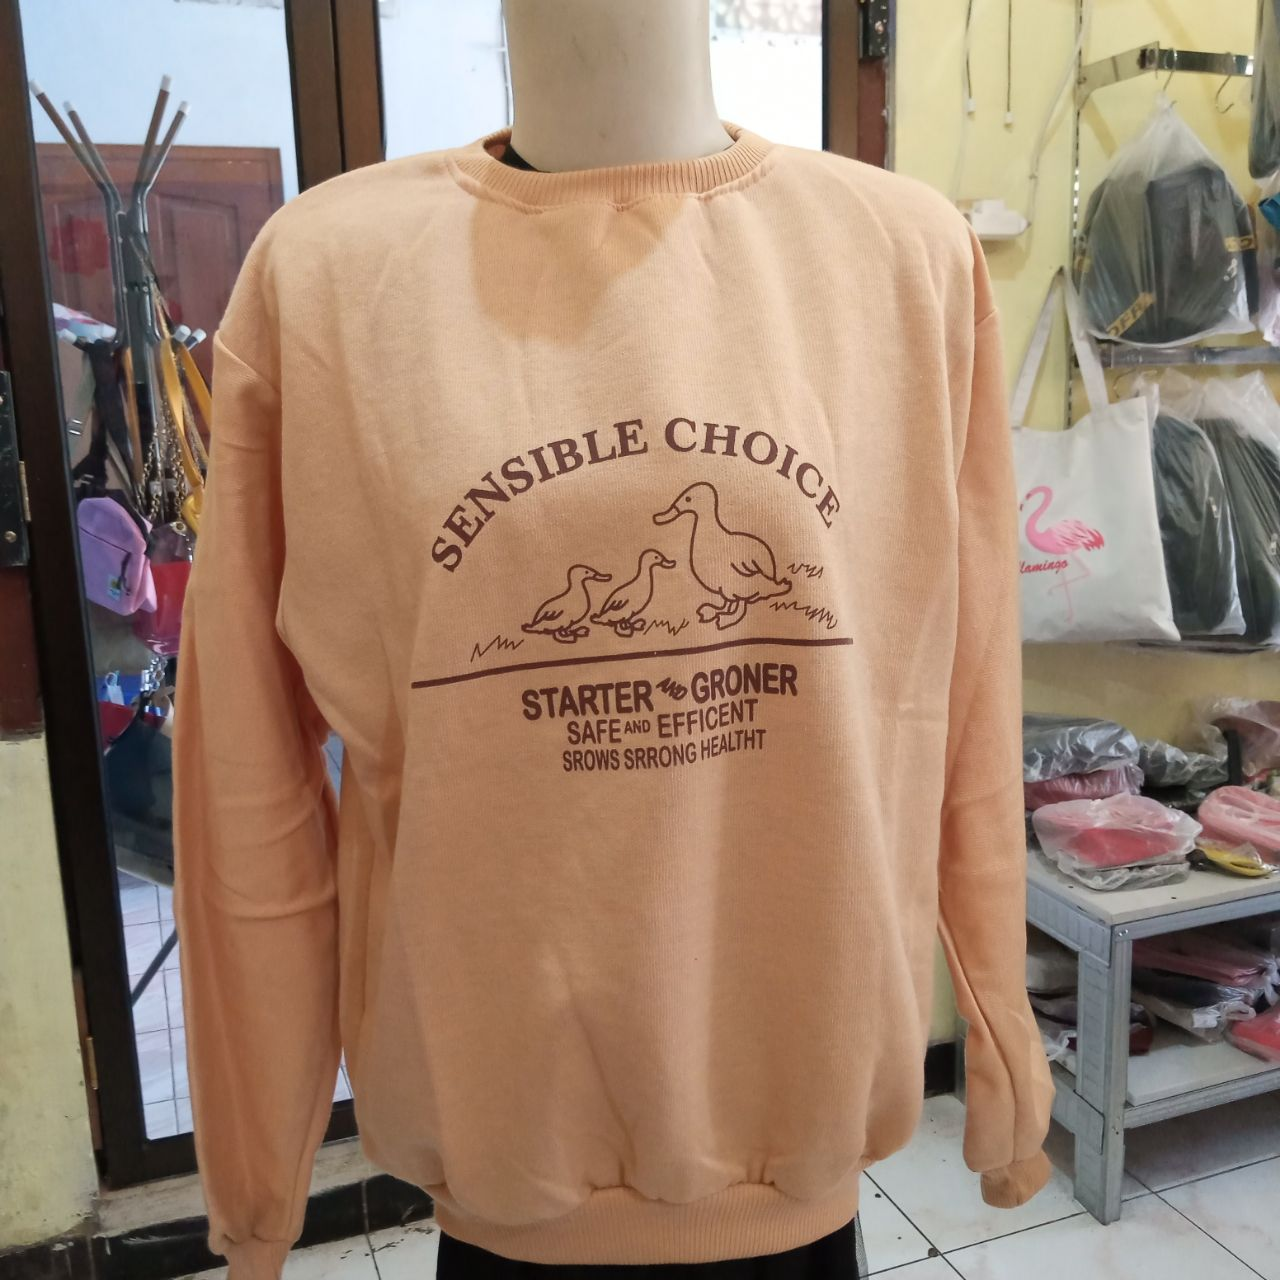 ini adalah Sweater Sensico Cream, size: LD 90cm, Panjang 60cm, material: Fleece, color: cream, brand: jaketindonesia, age_group: all ages, gender: unisex